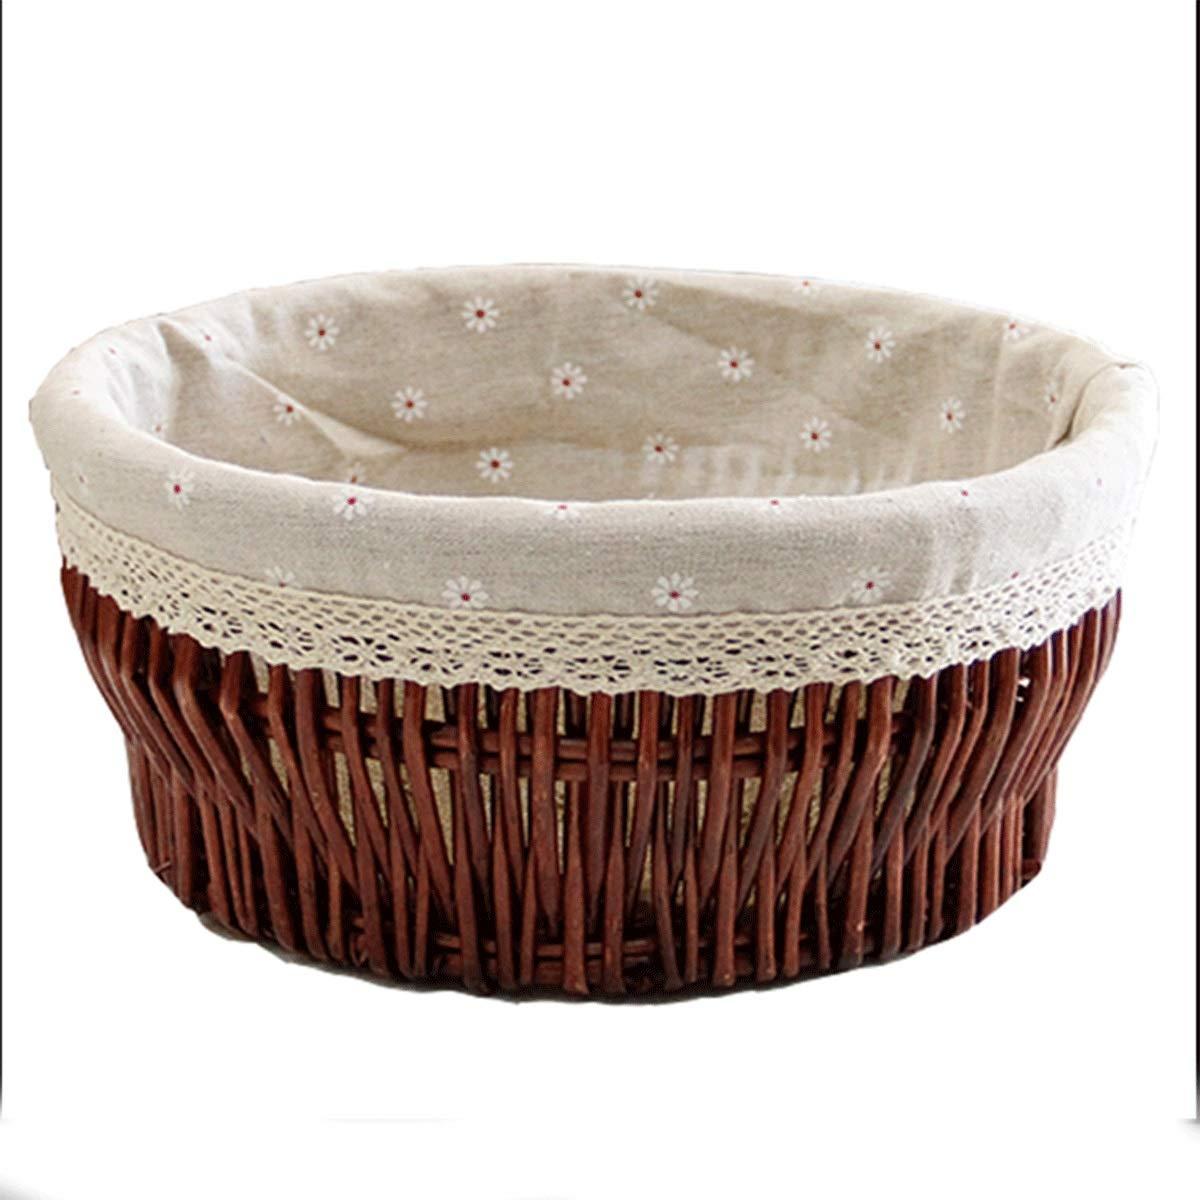 Muziwenju Storage Box, Food Basket, Rattan Cosmetic Box, IKEA Finishing Storage Basket, Tabletop Snack Tea Basket, Round (Size : XXL(4016cm))